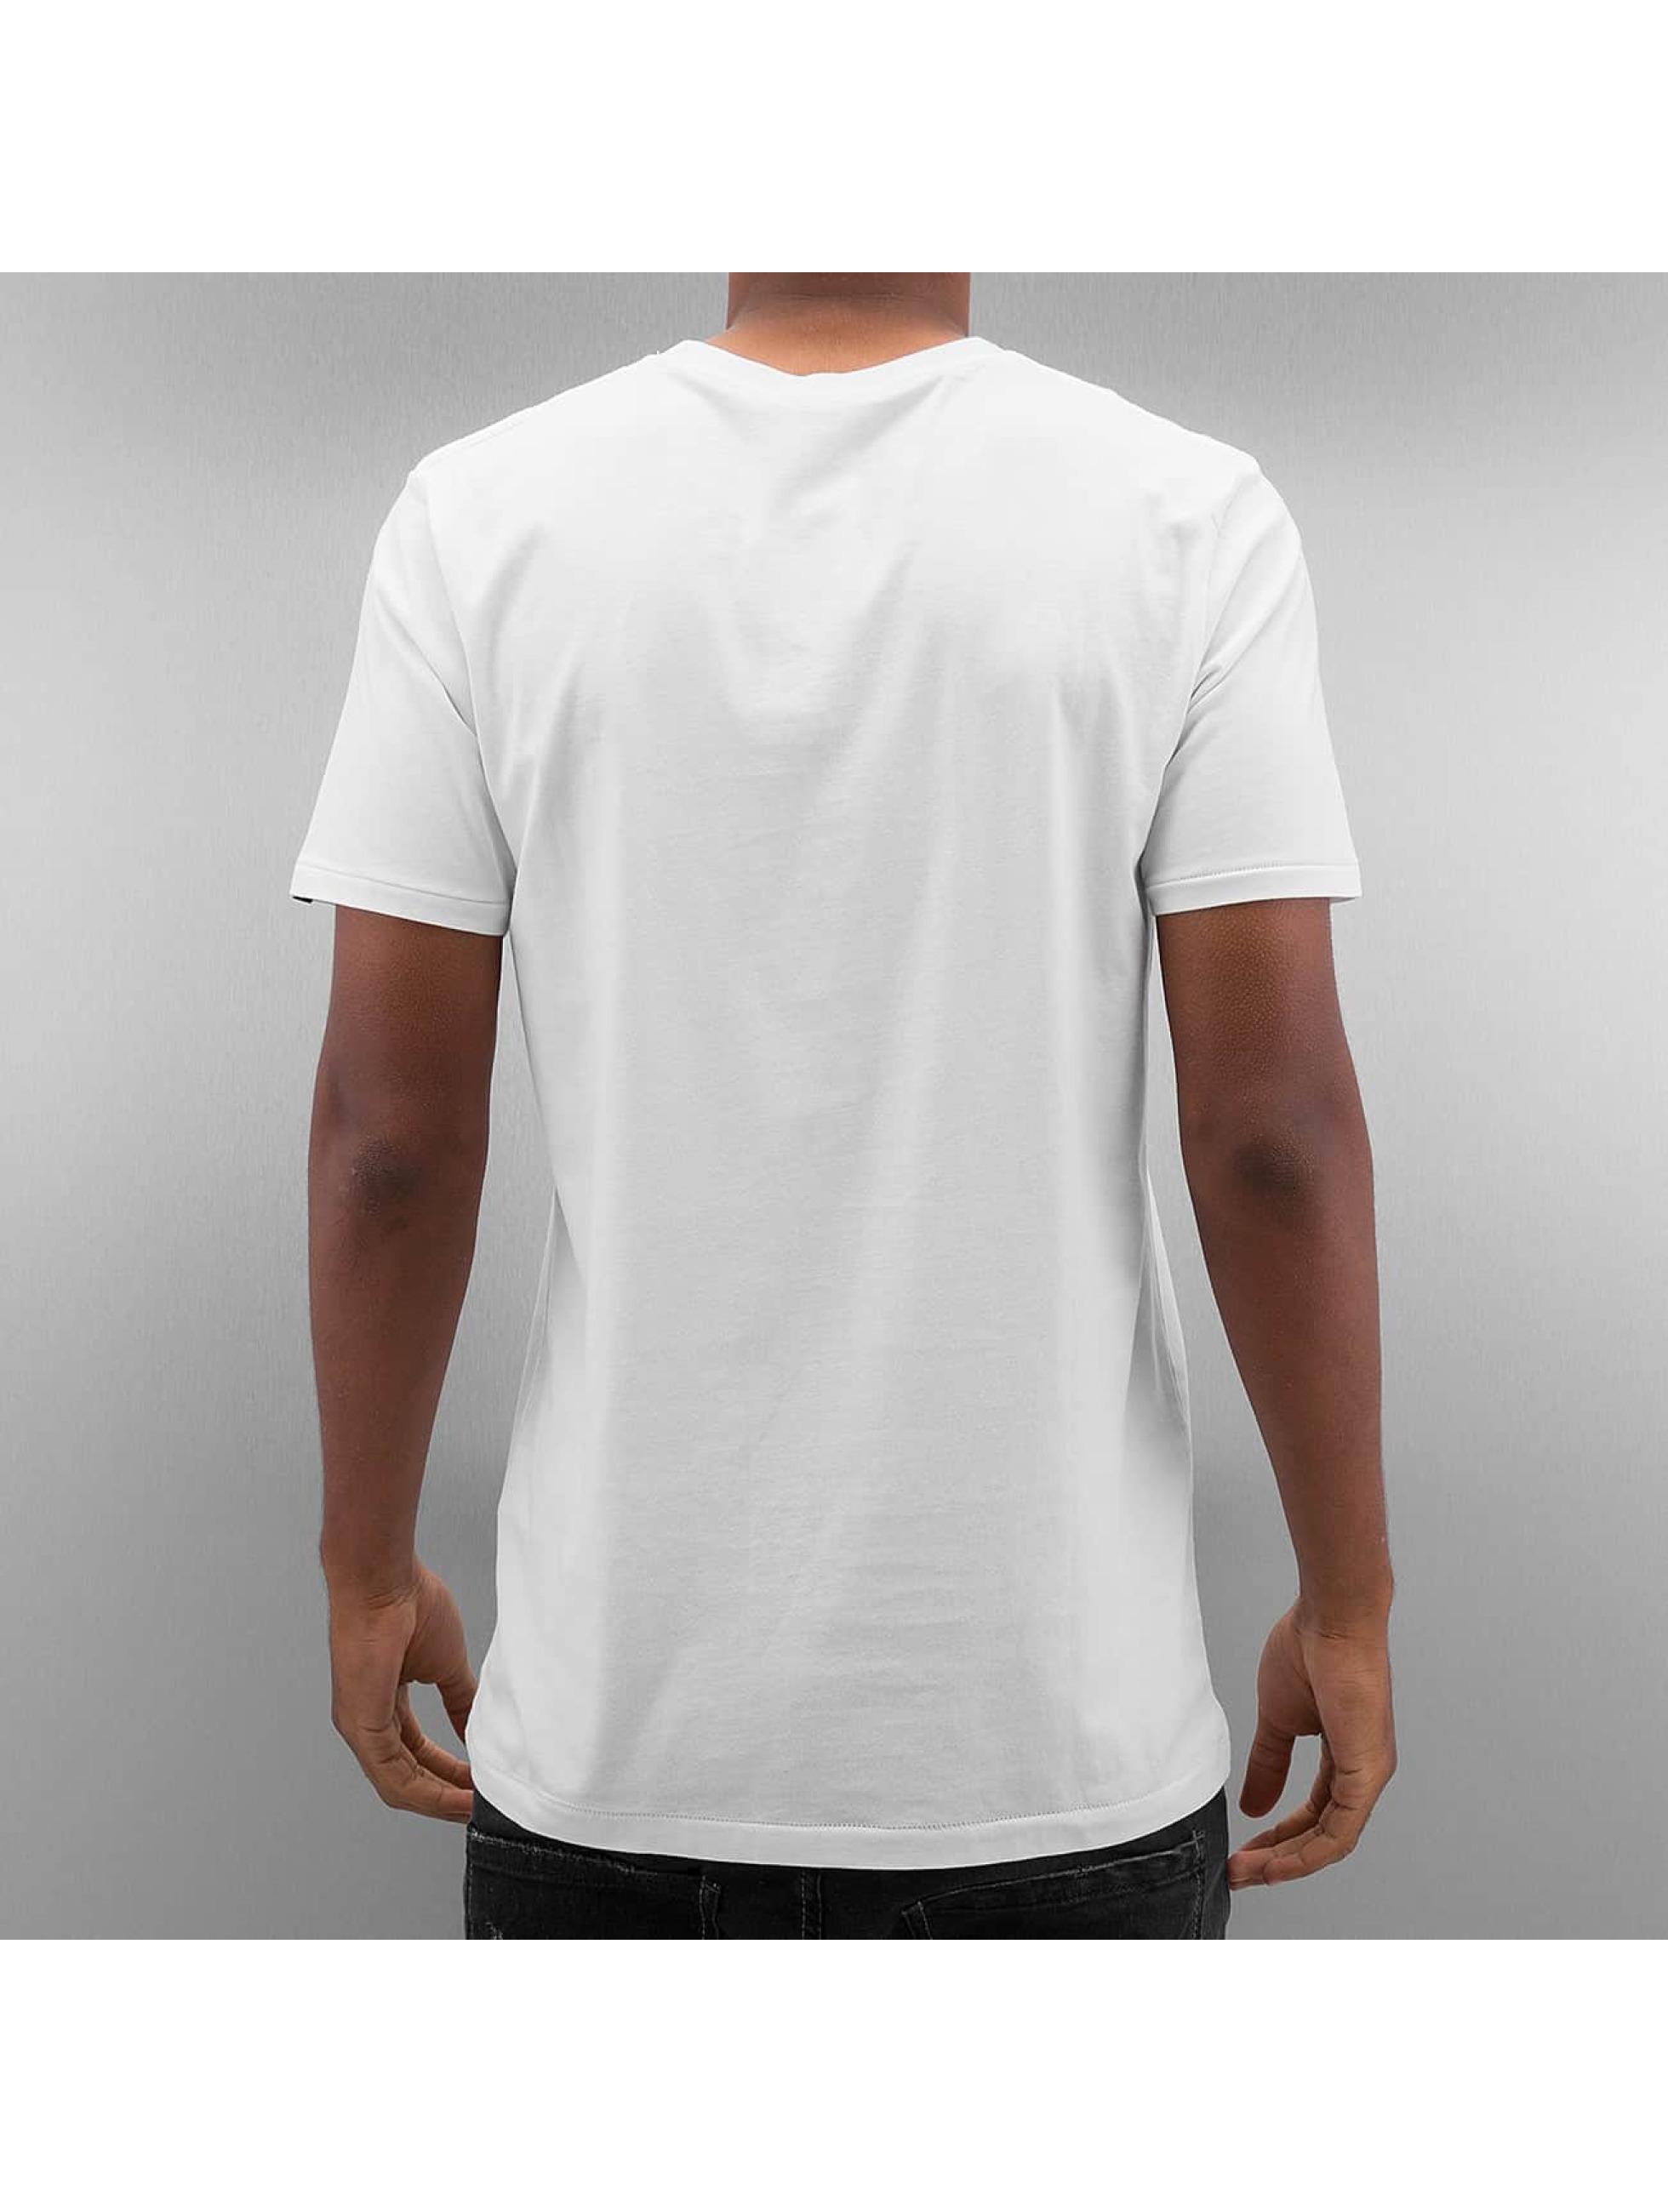 The Dudes T-Shirt Bad Dood blanc